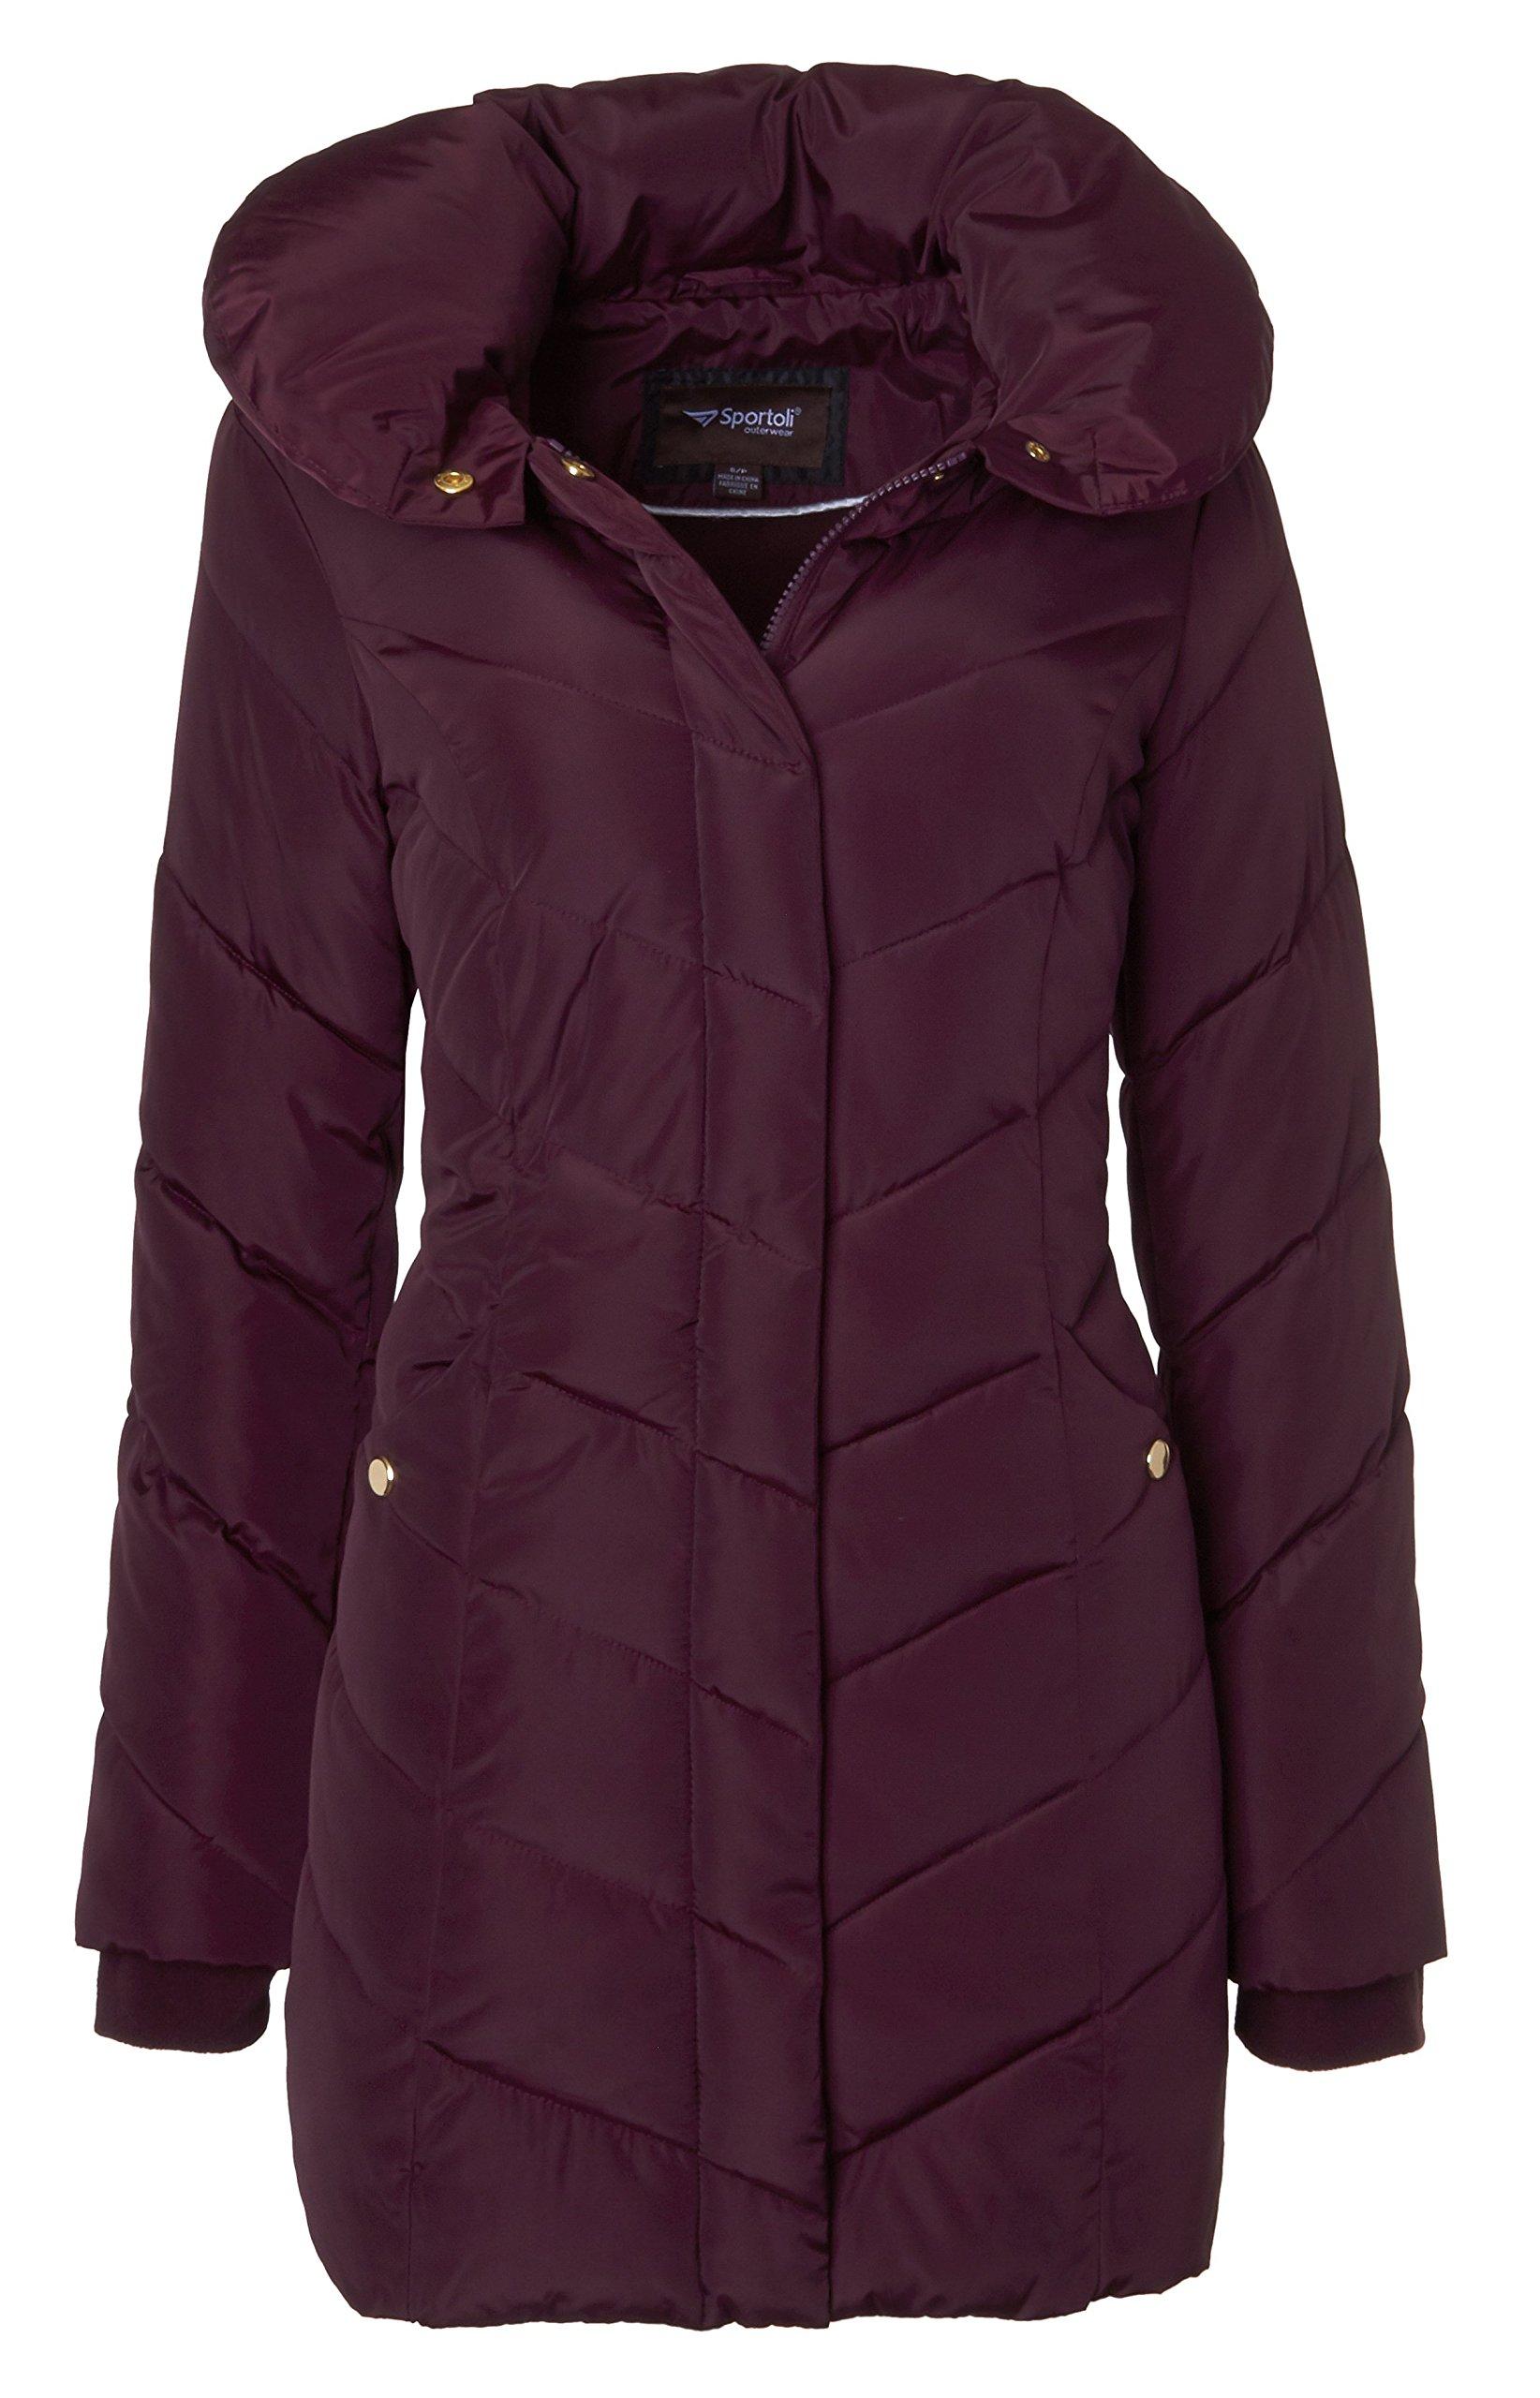 Sportoli Womens Winter Fleece Lined Chevron Quilted Puffer Jacket Coat with Hood - Merlot (Size X-Large)